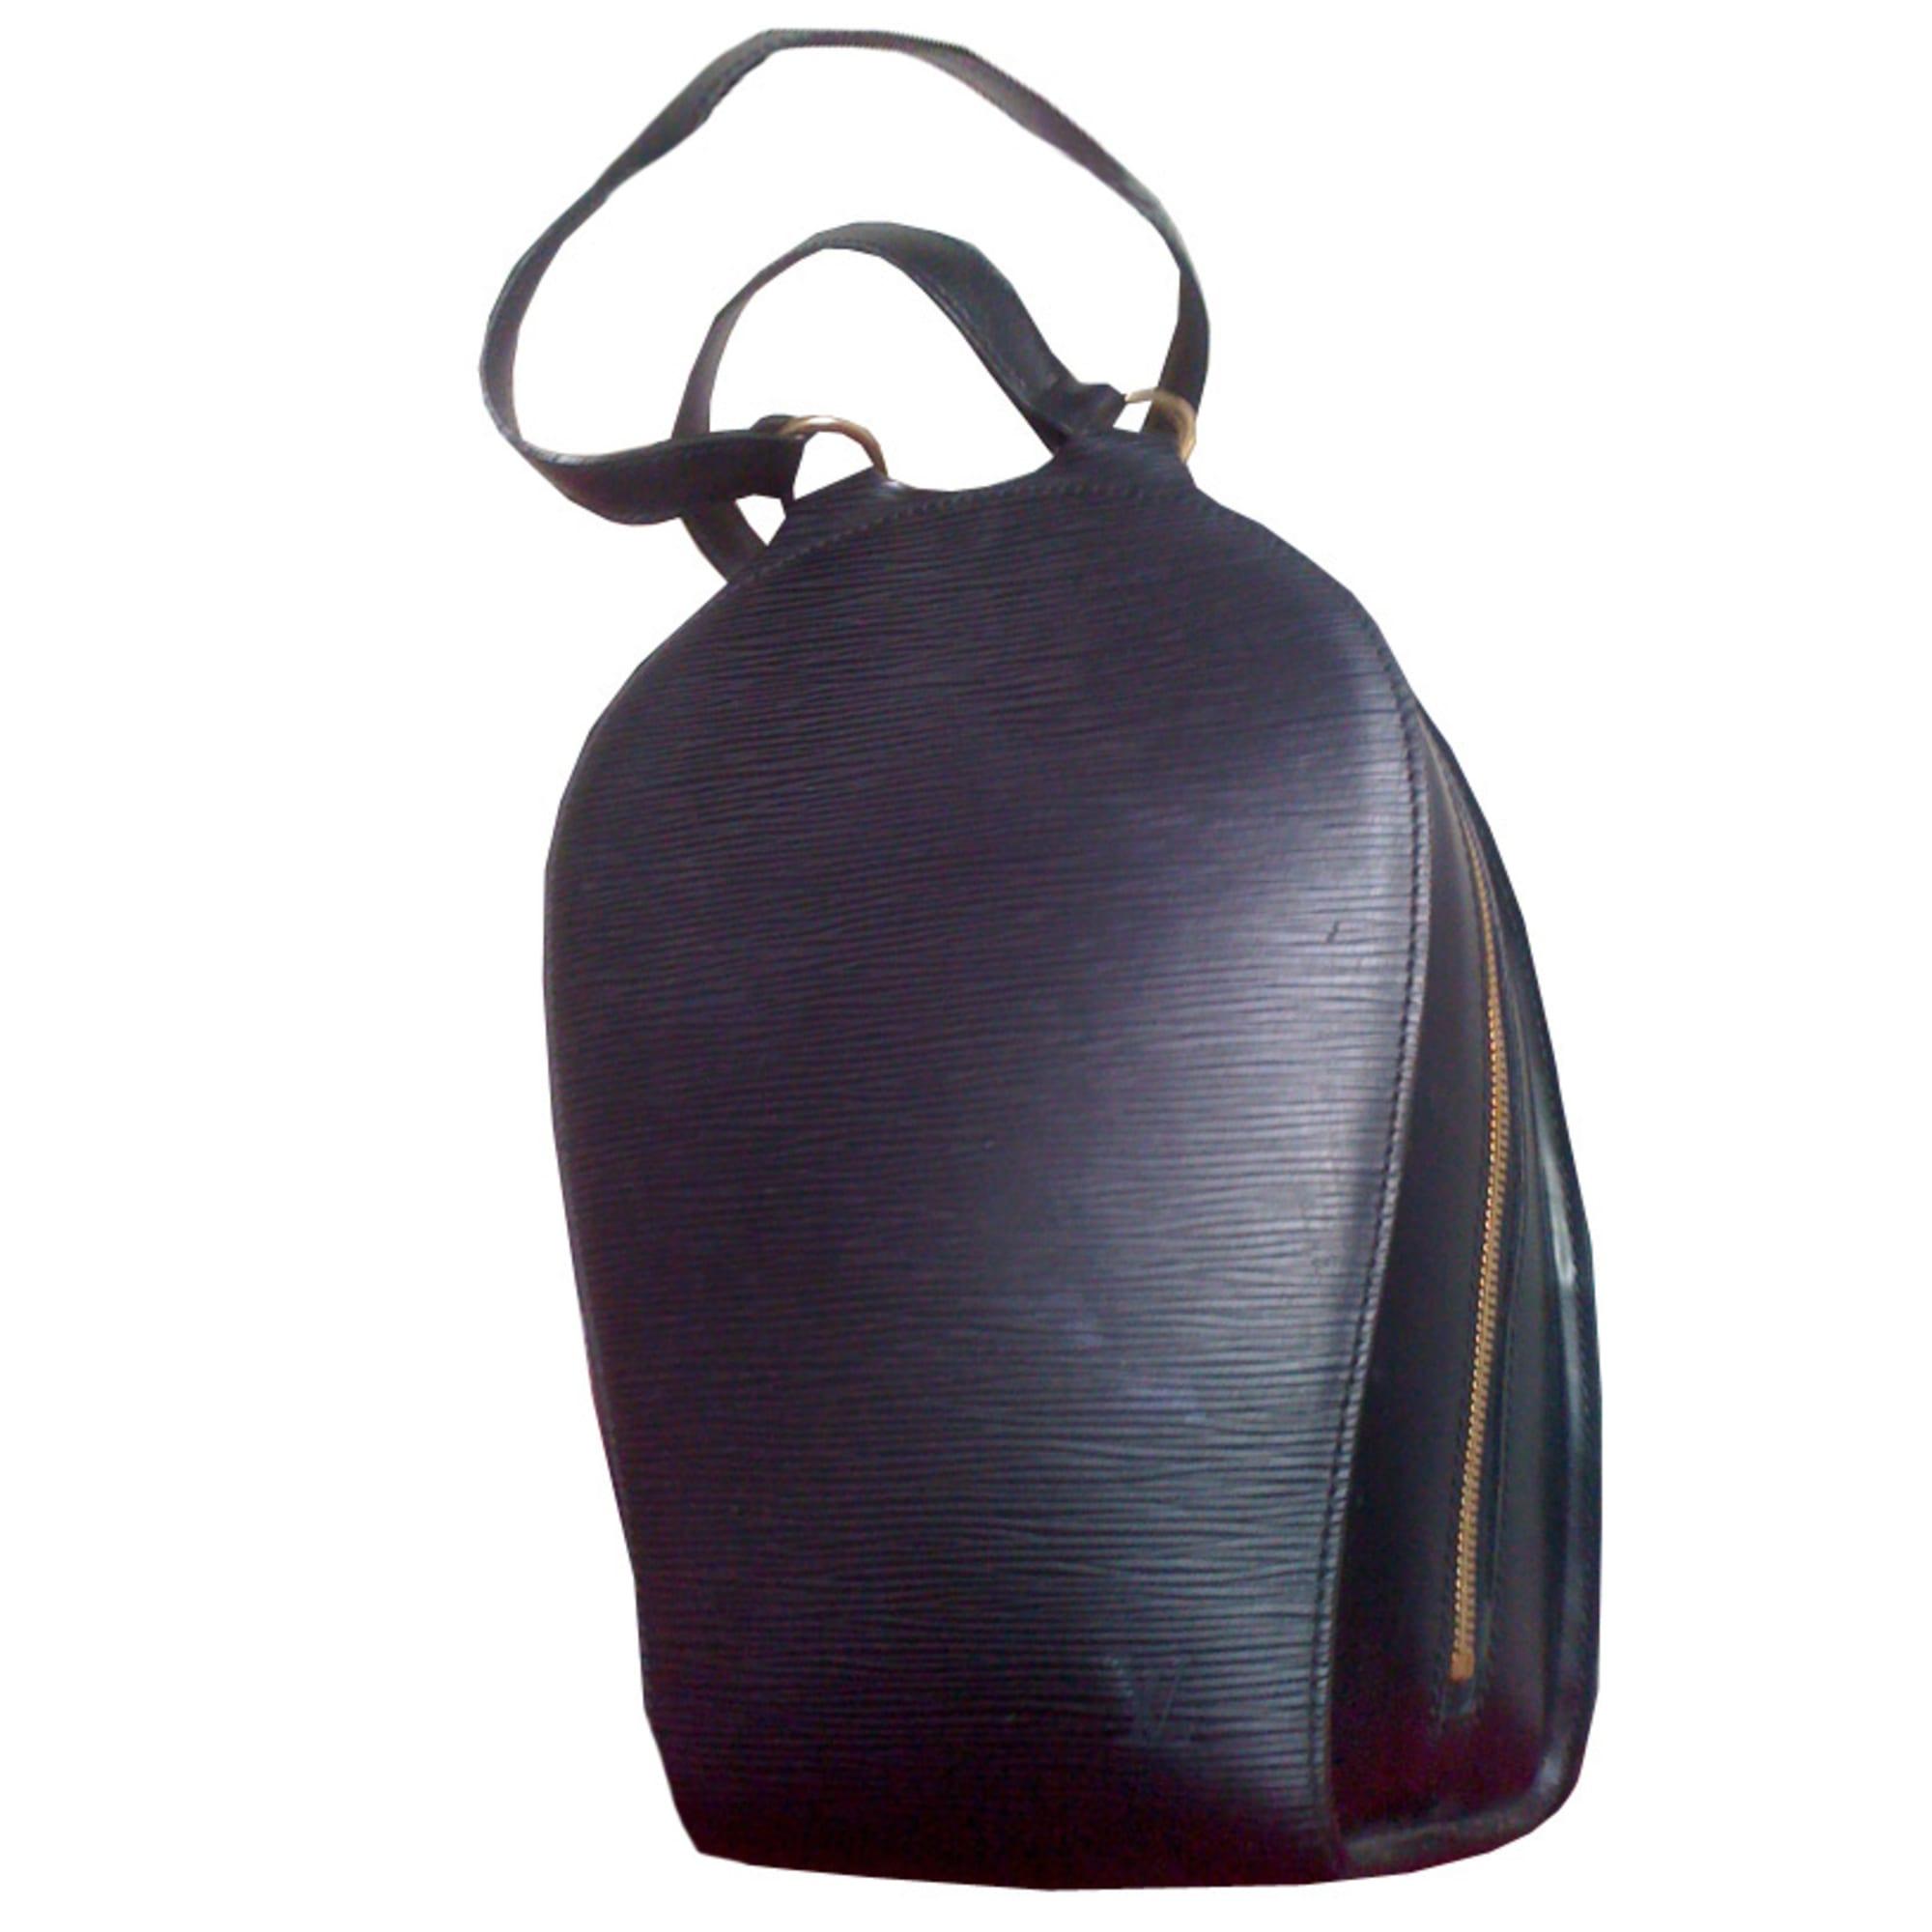 Sac A Dos Louis Vuitton Femme Occasion - - vinny.oleo-vegetal.info 62669373279